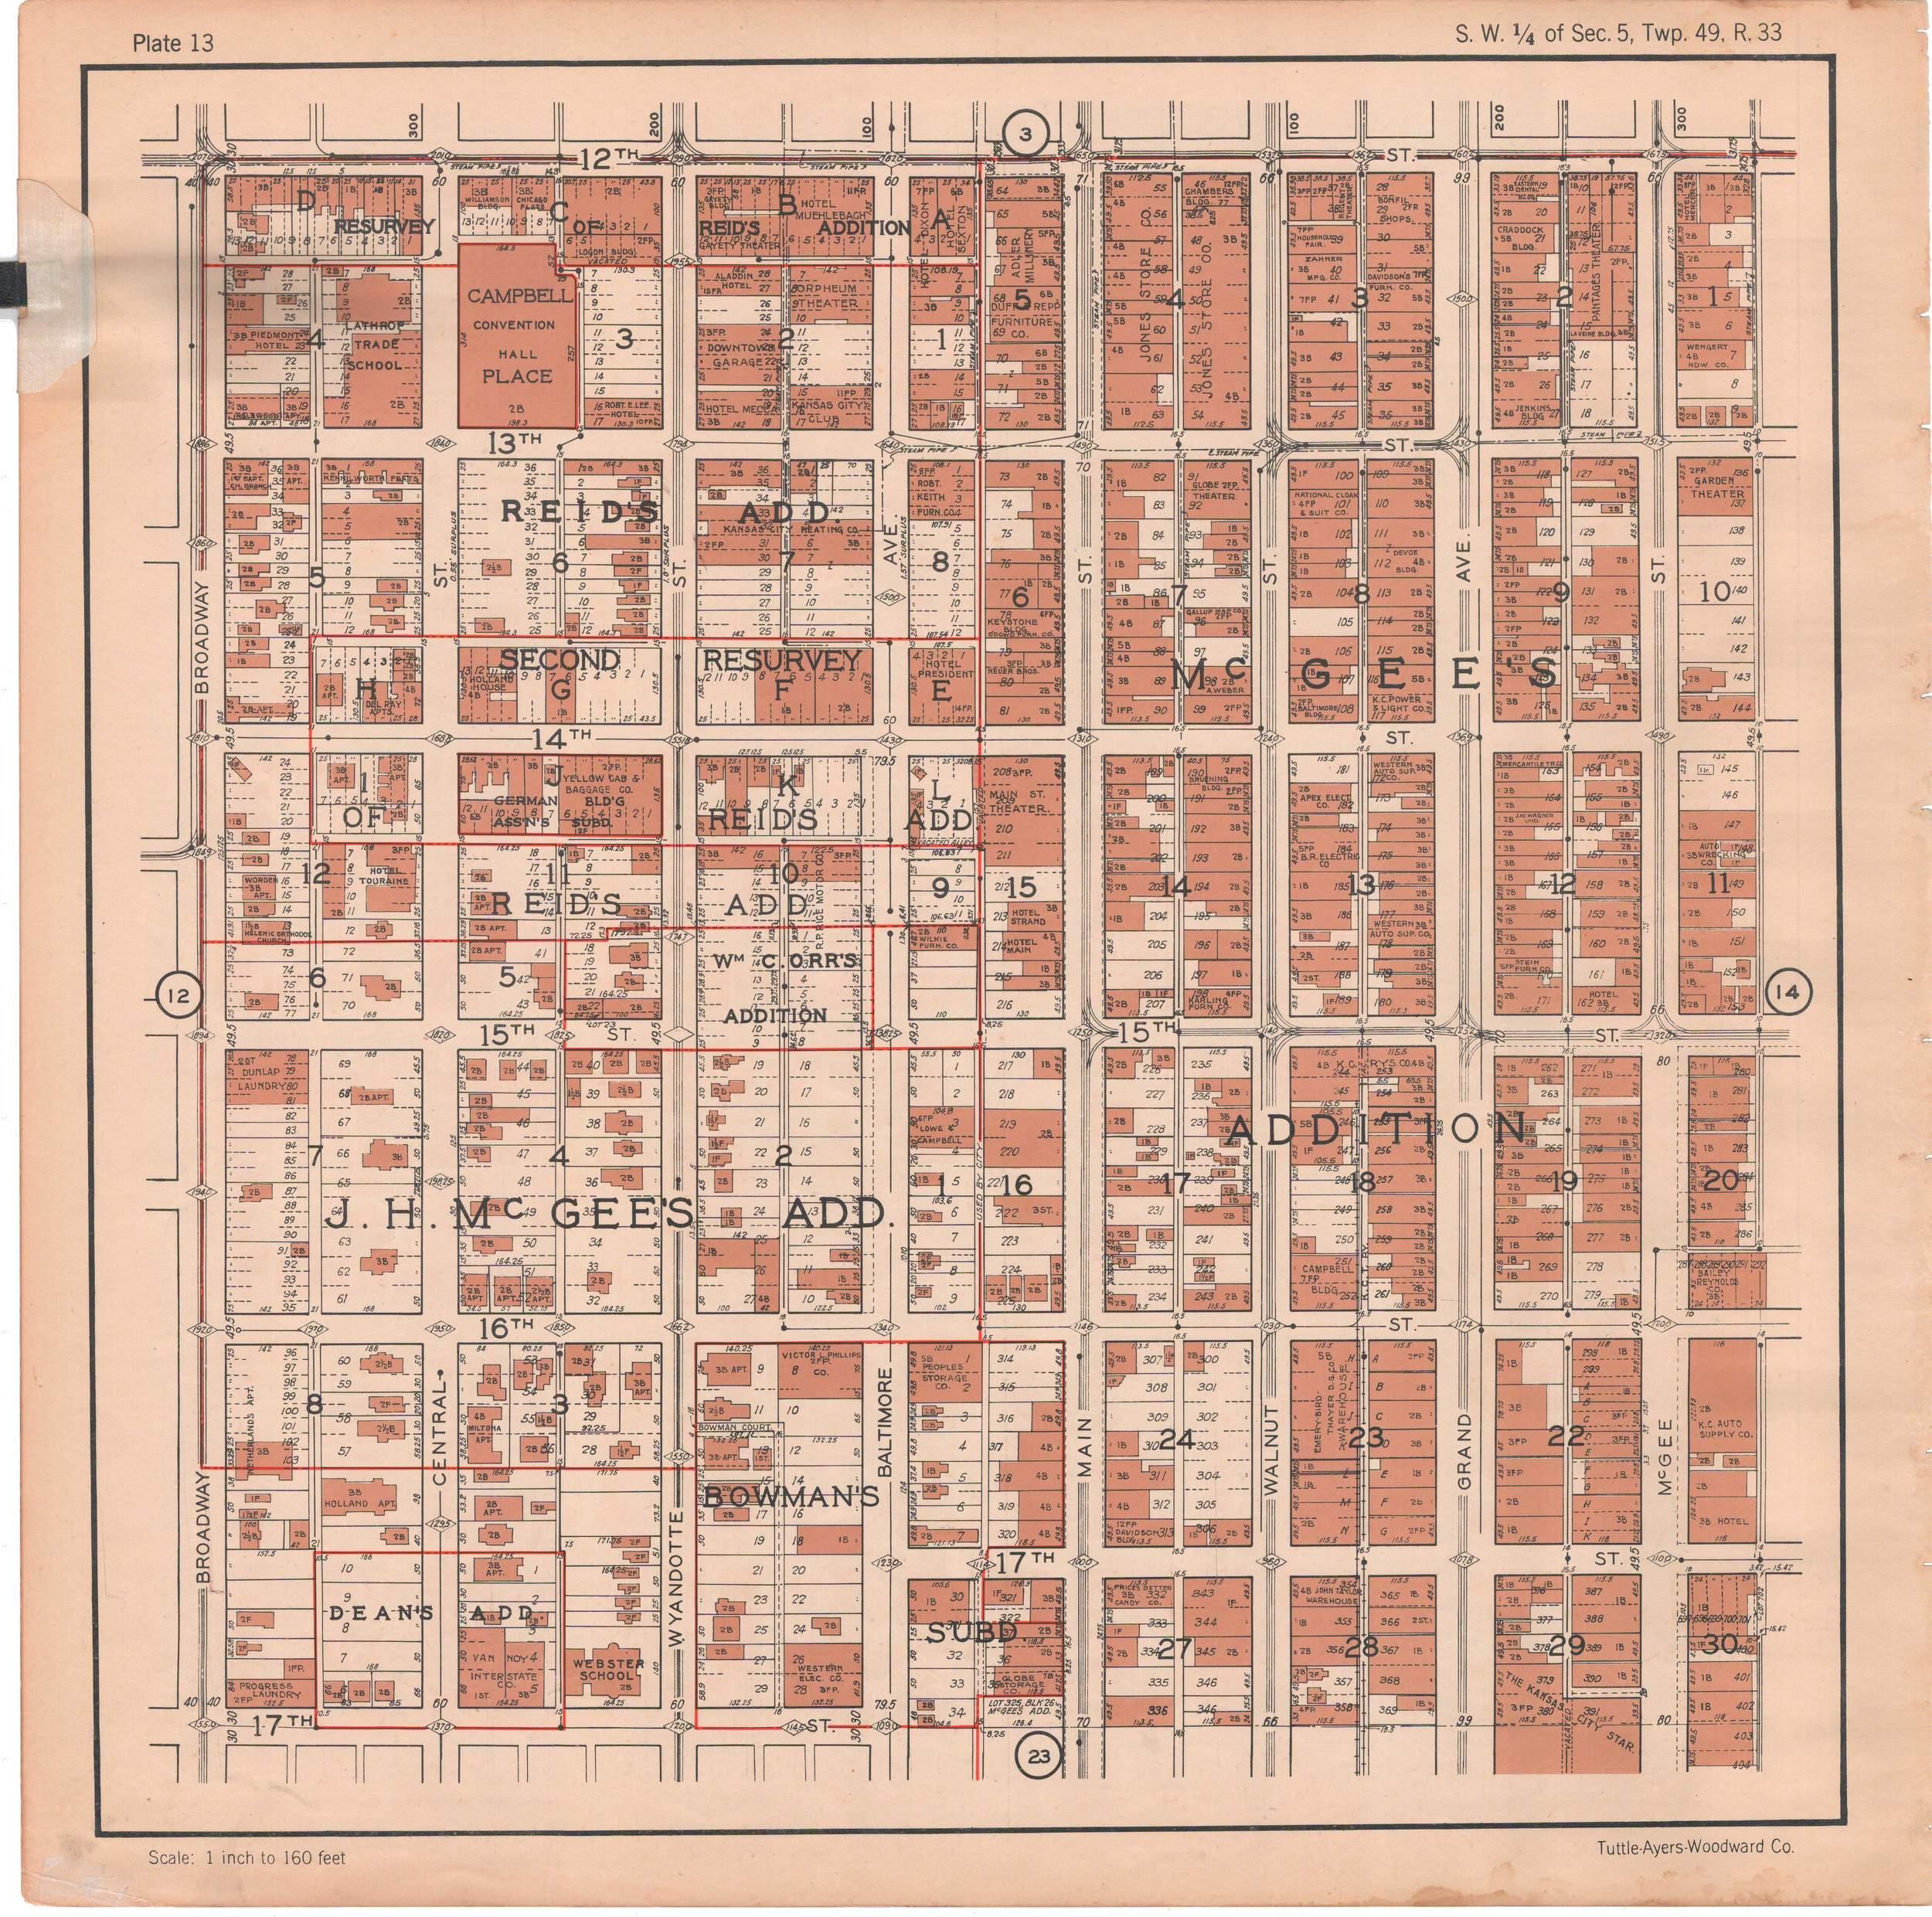 1925 TUTTLE_AYERS_Plate 13.JPG